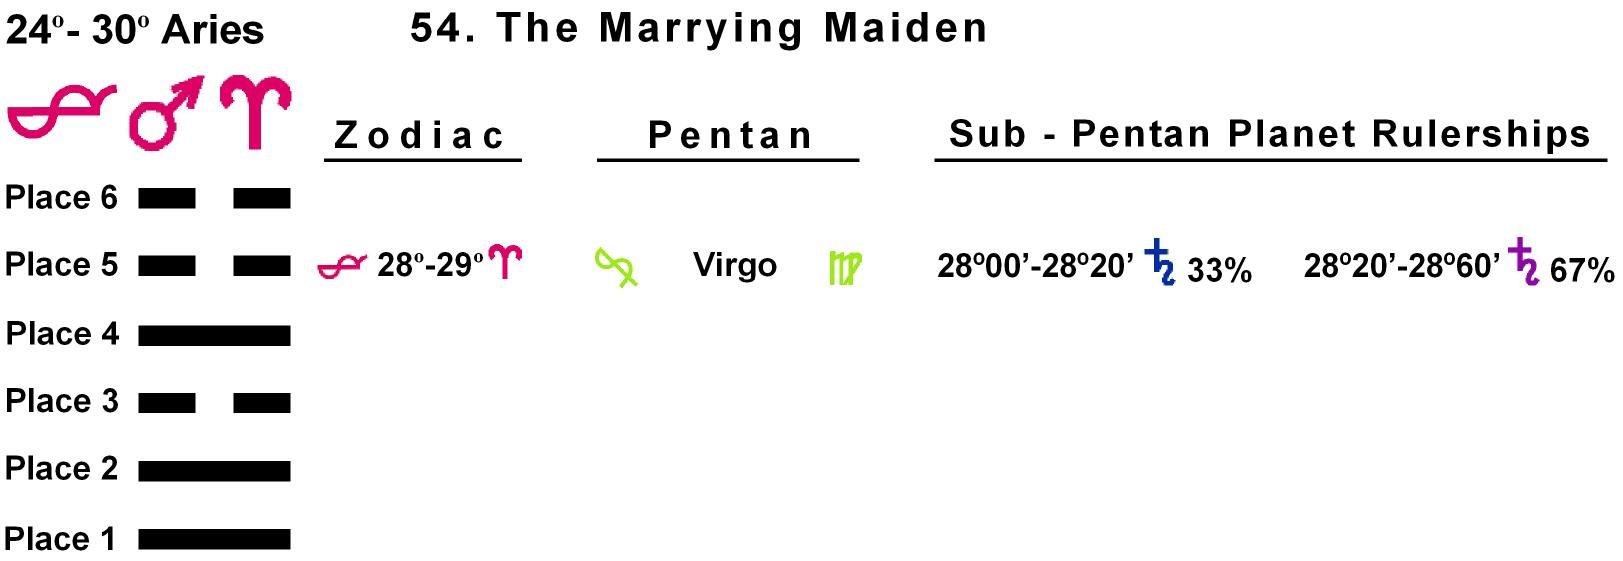 Pent-lines-01AR 28-29 Hx-54 Marrying Maiden